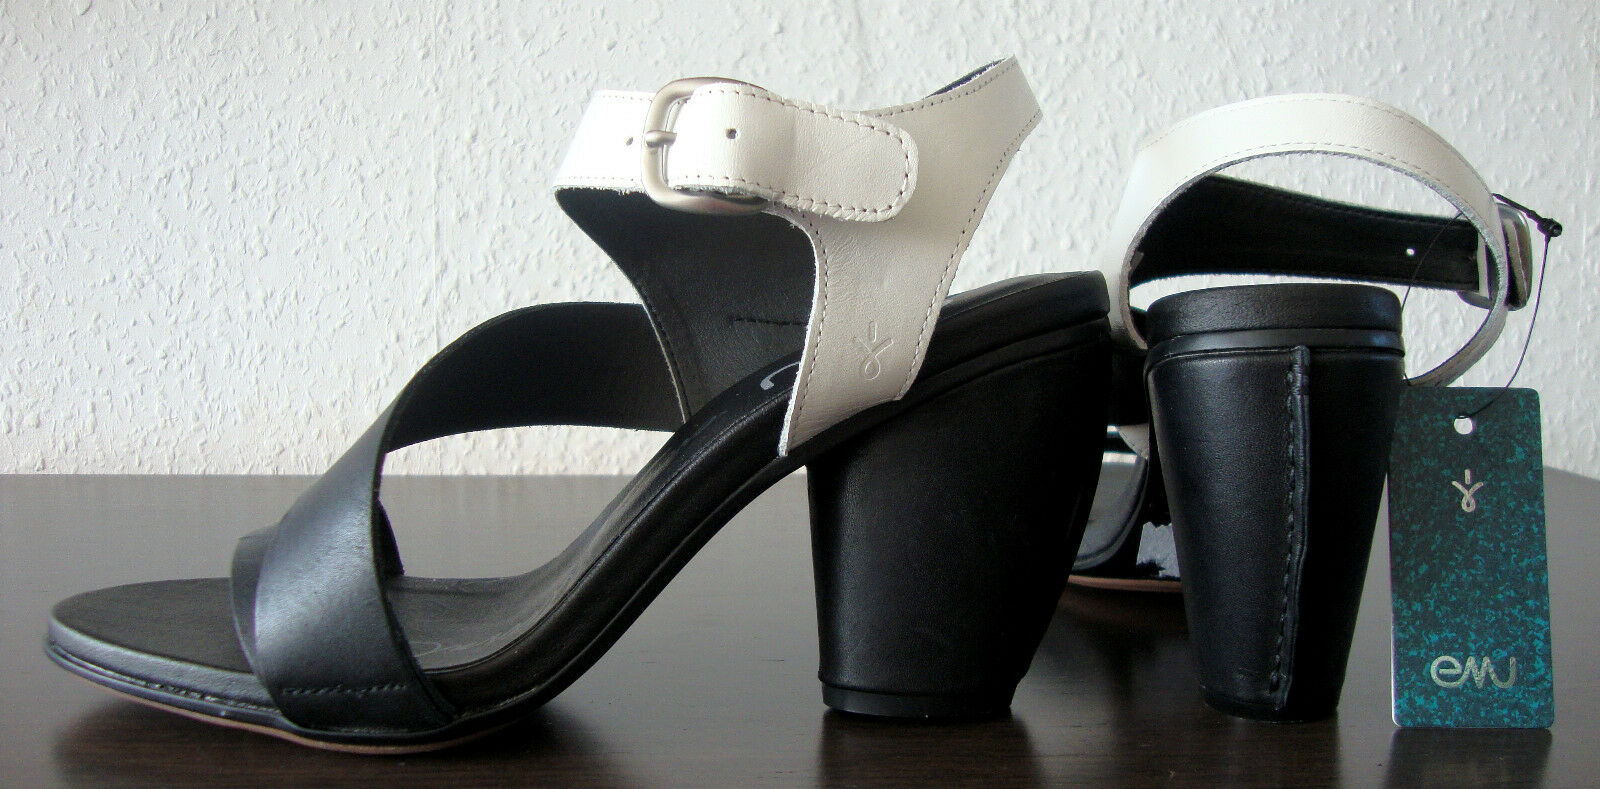 EMU Dawn sandals donna pelle Leather Scarpe Décolleté in pelle donna Sandali Sandali Tg. 39 NUOVO 09f7ae